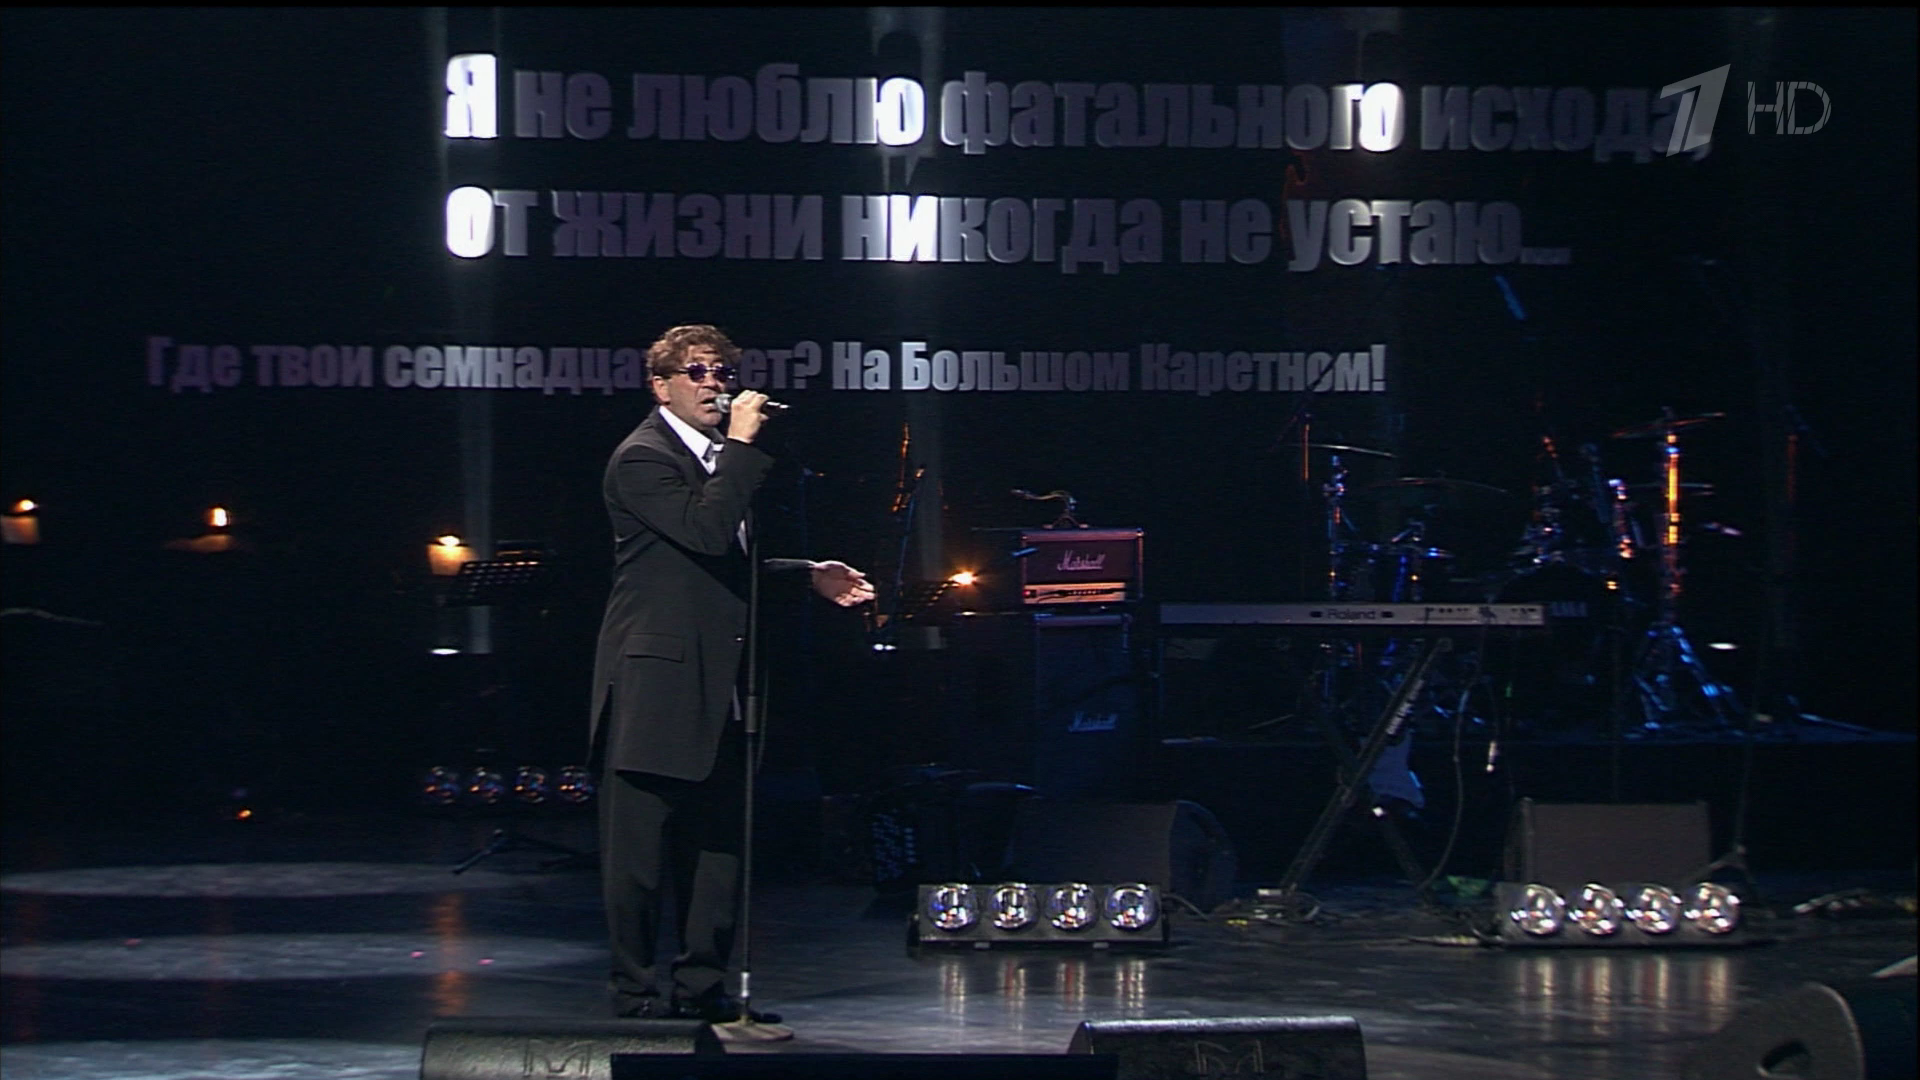 http://i6.imageban.ru/out/2013/06/19/30eb7af5328c4a2b15b7b5323e6252c9.png